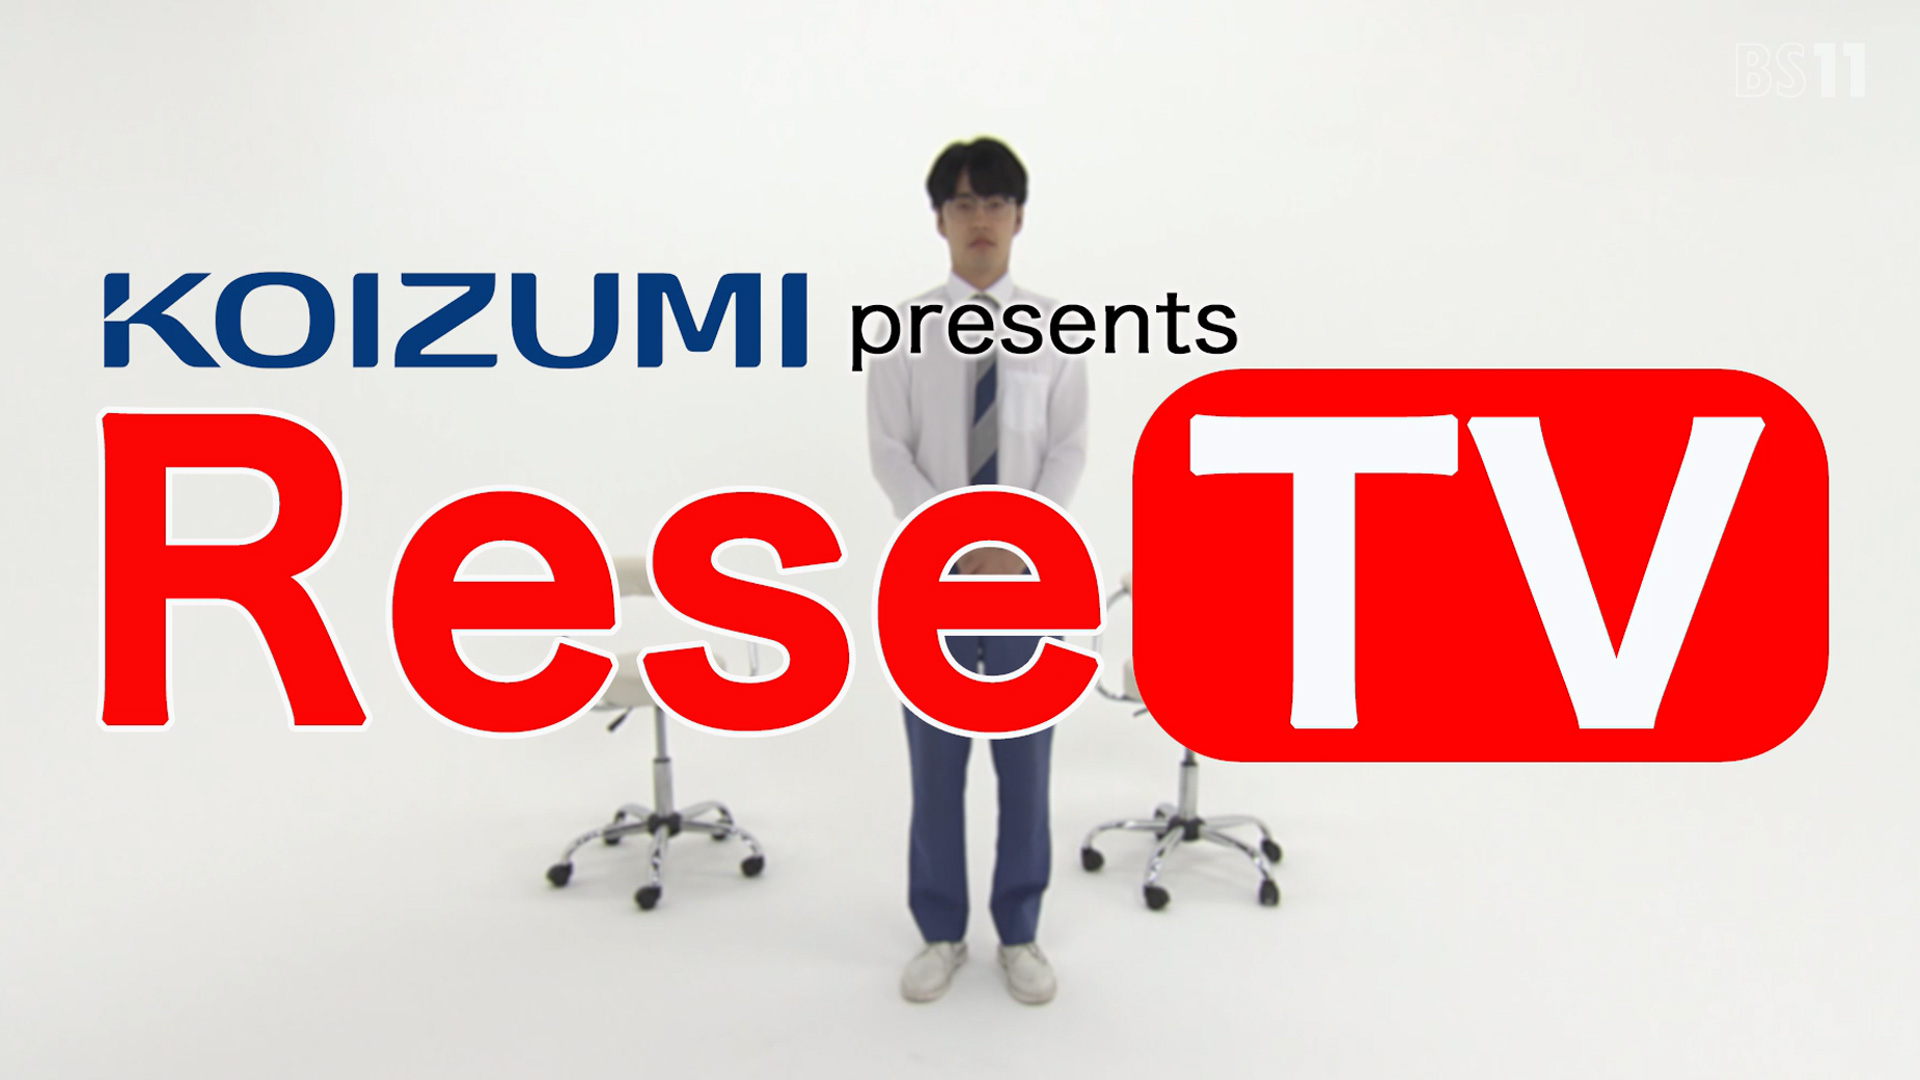 KOIZUMI presents ReseTV